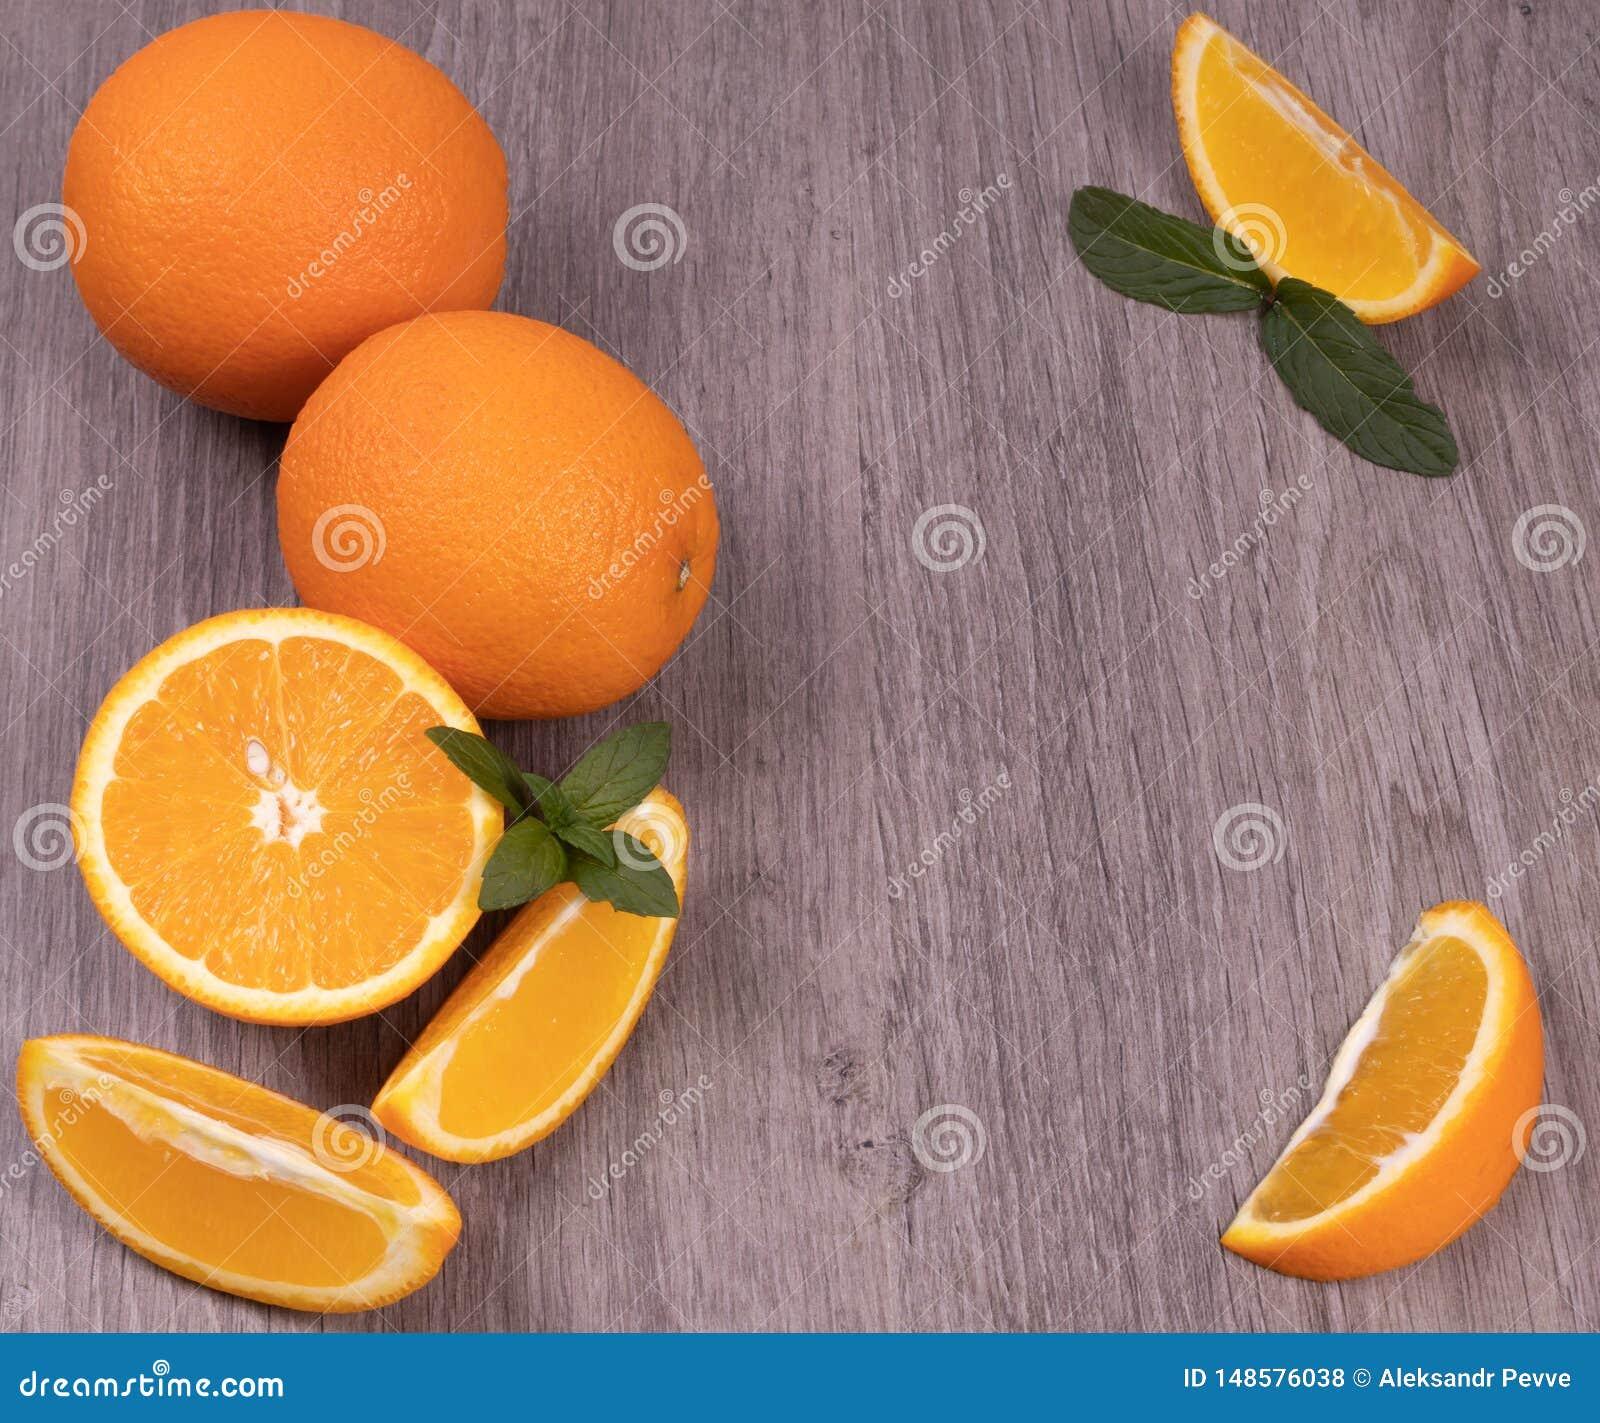 Composición de naranjas en un fondo de madera